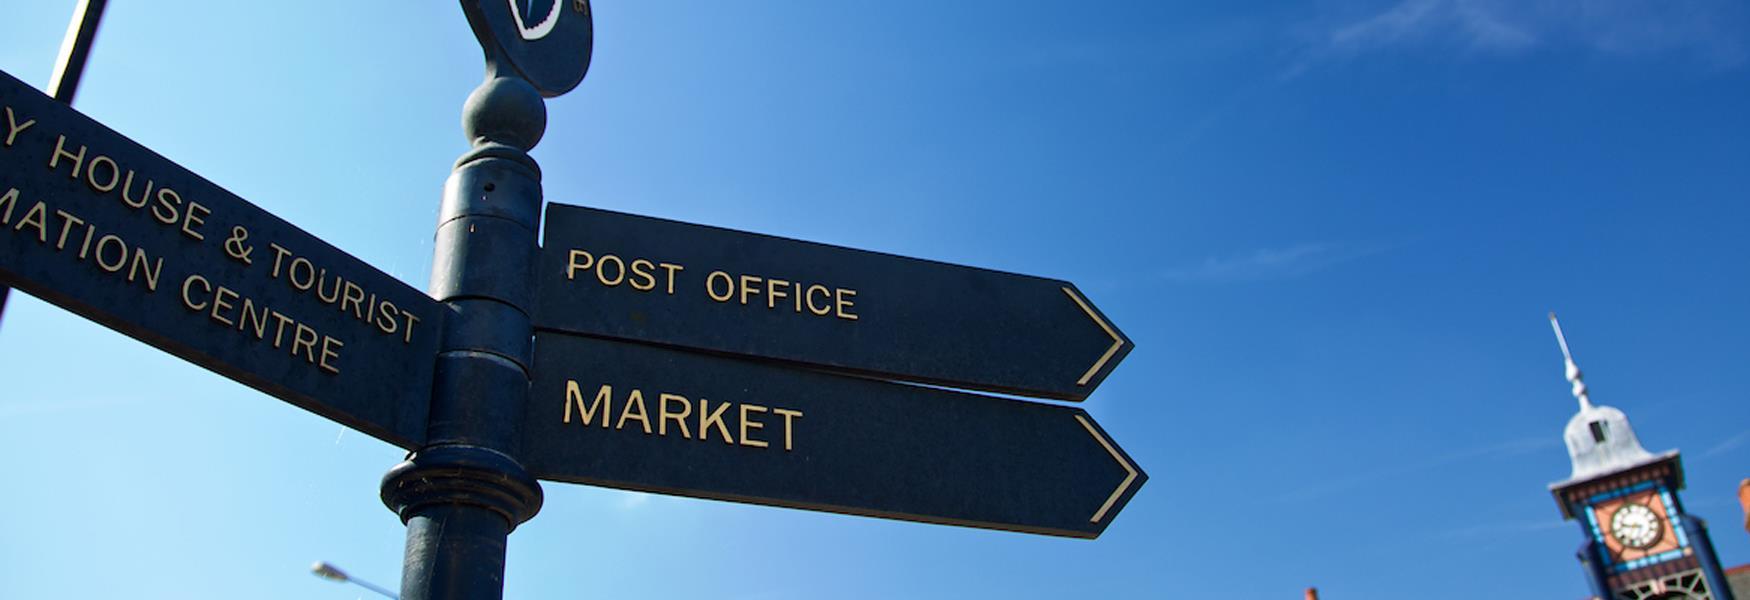 Signpost Dunstable